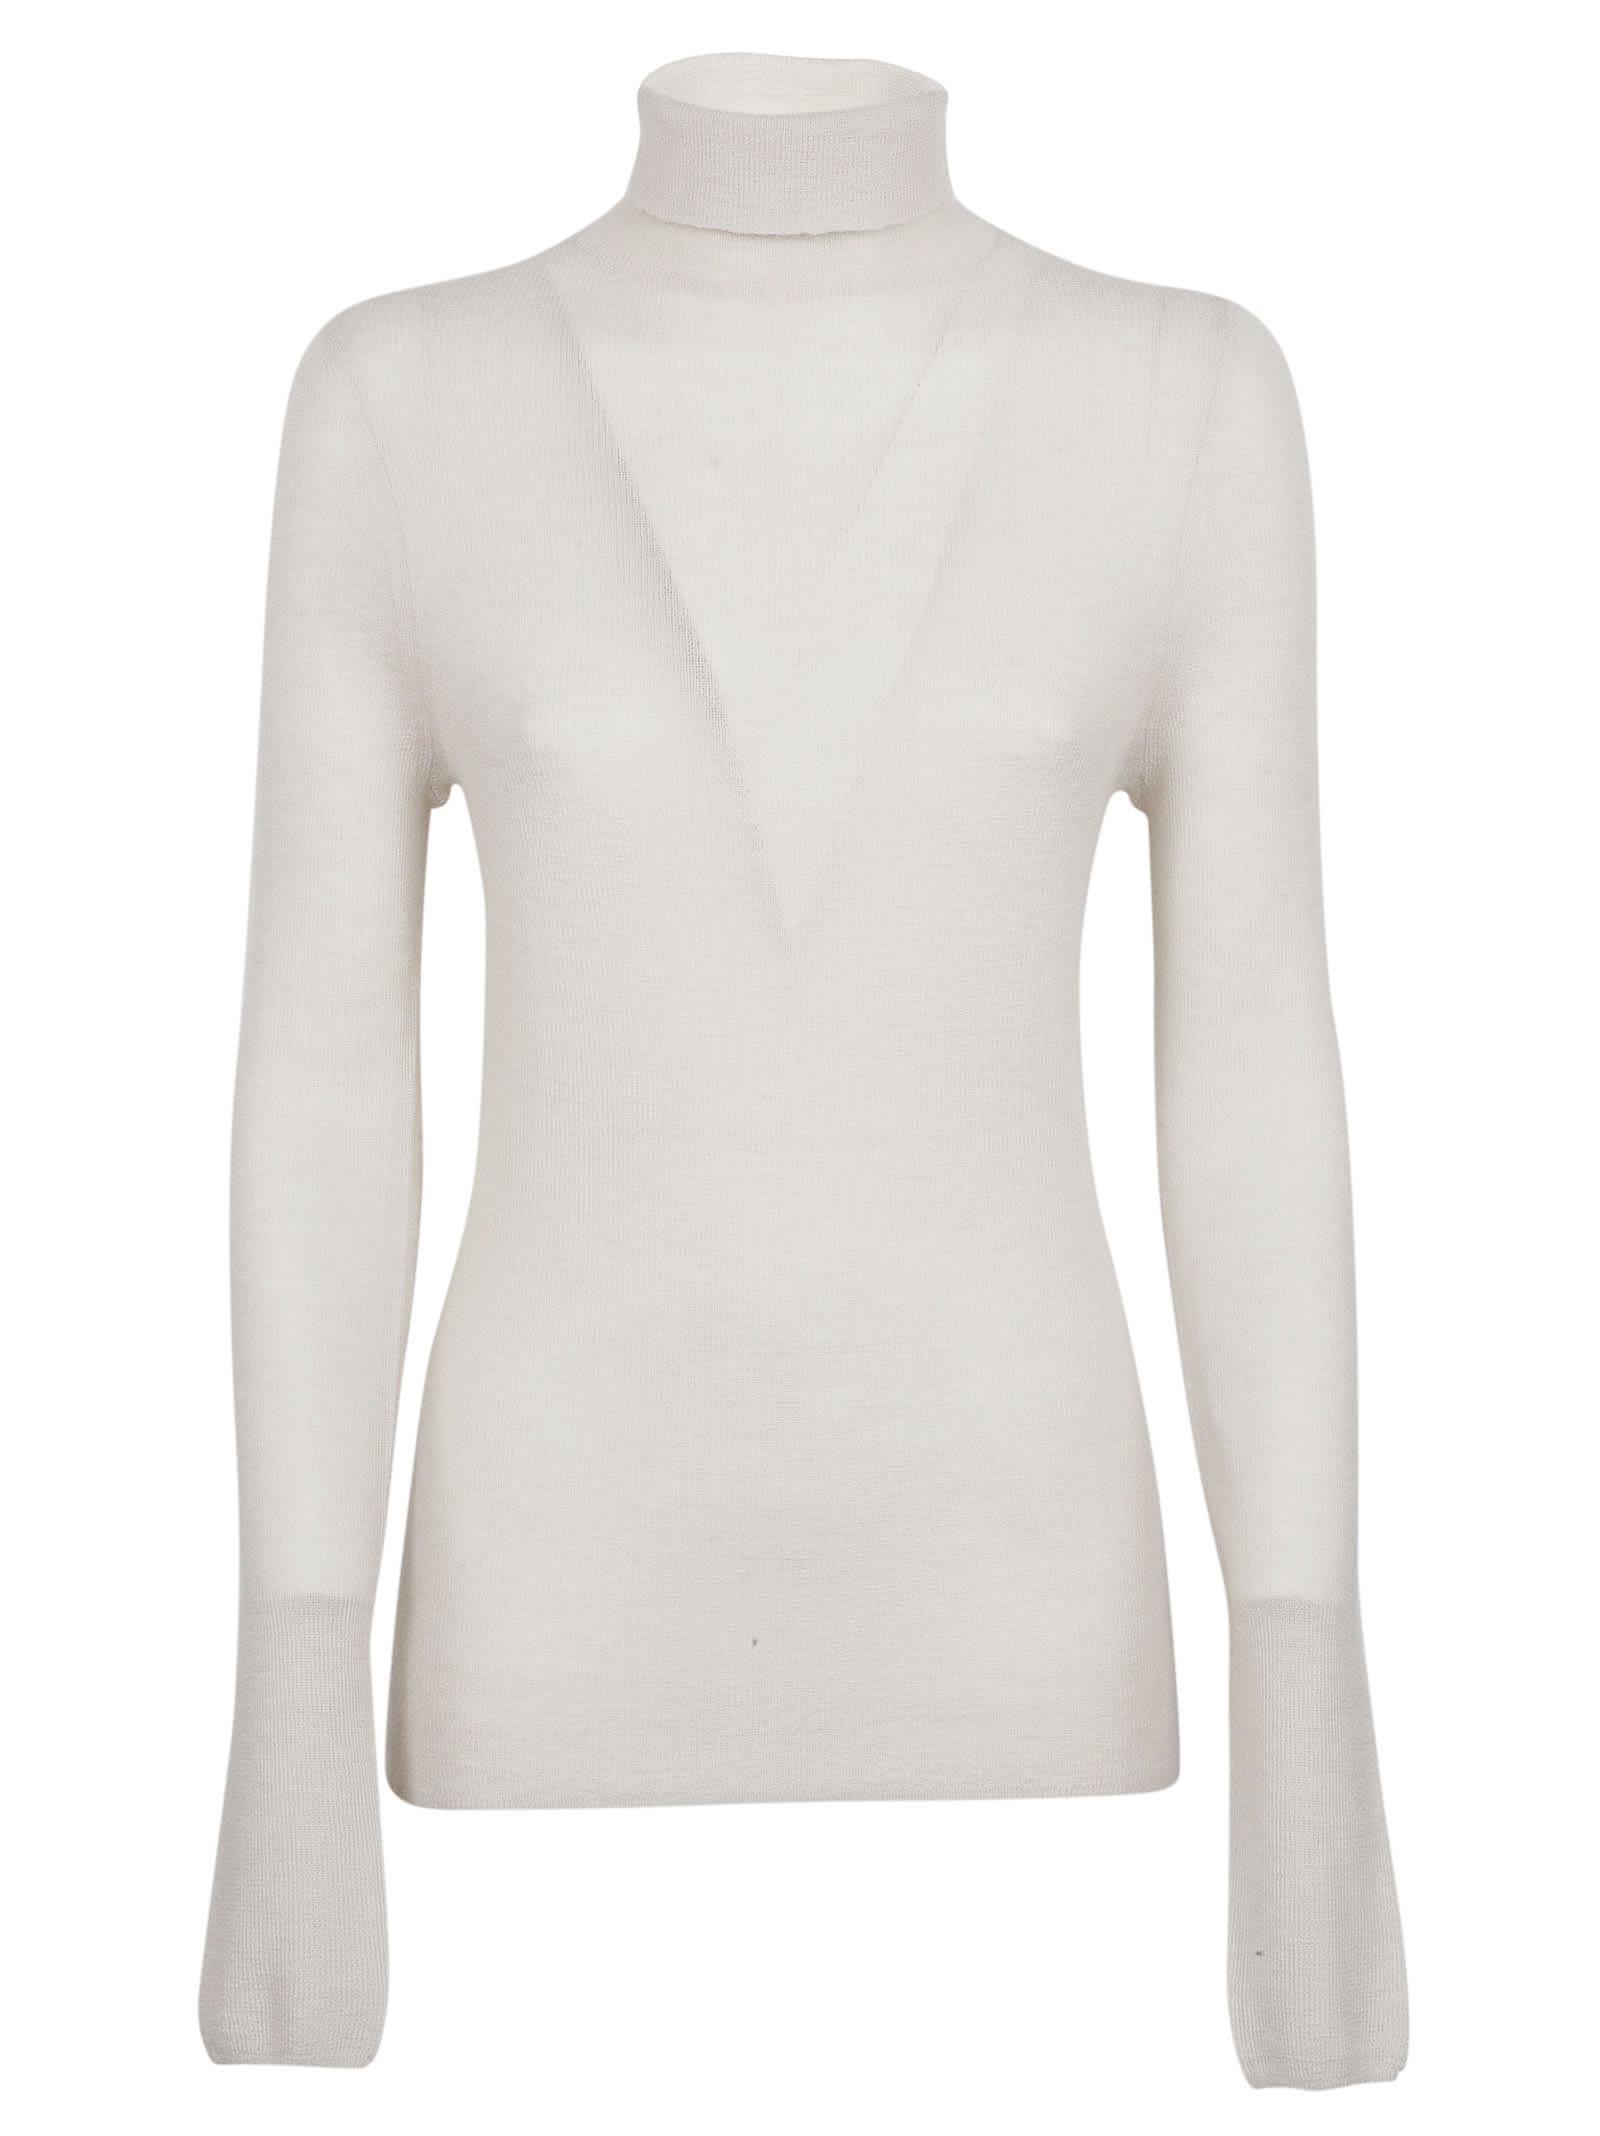 67b4fcdad0 360 Sweater 360 Sweater Jordan Sweater - Gray - 10065405 | italist